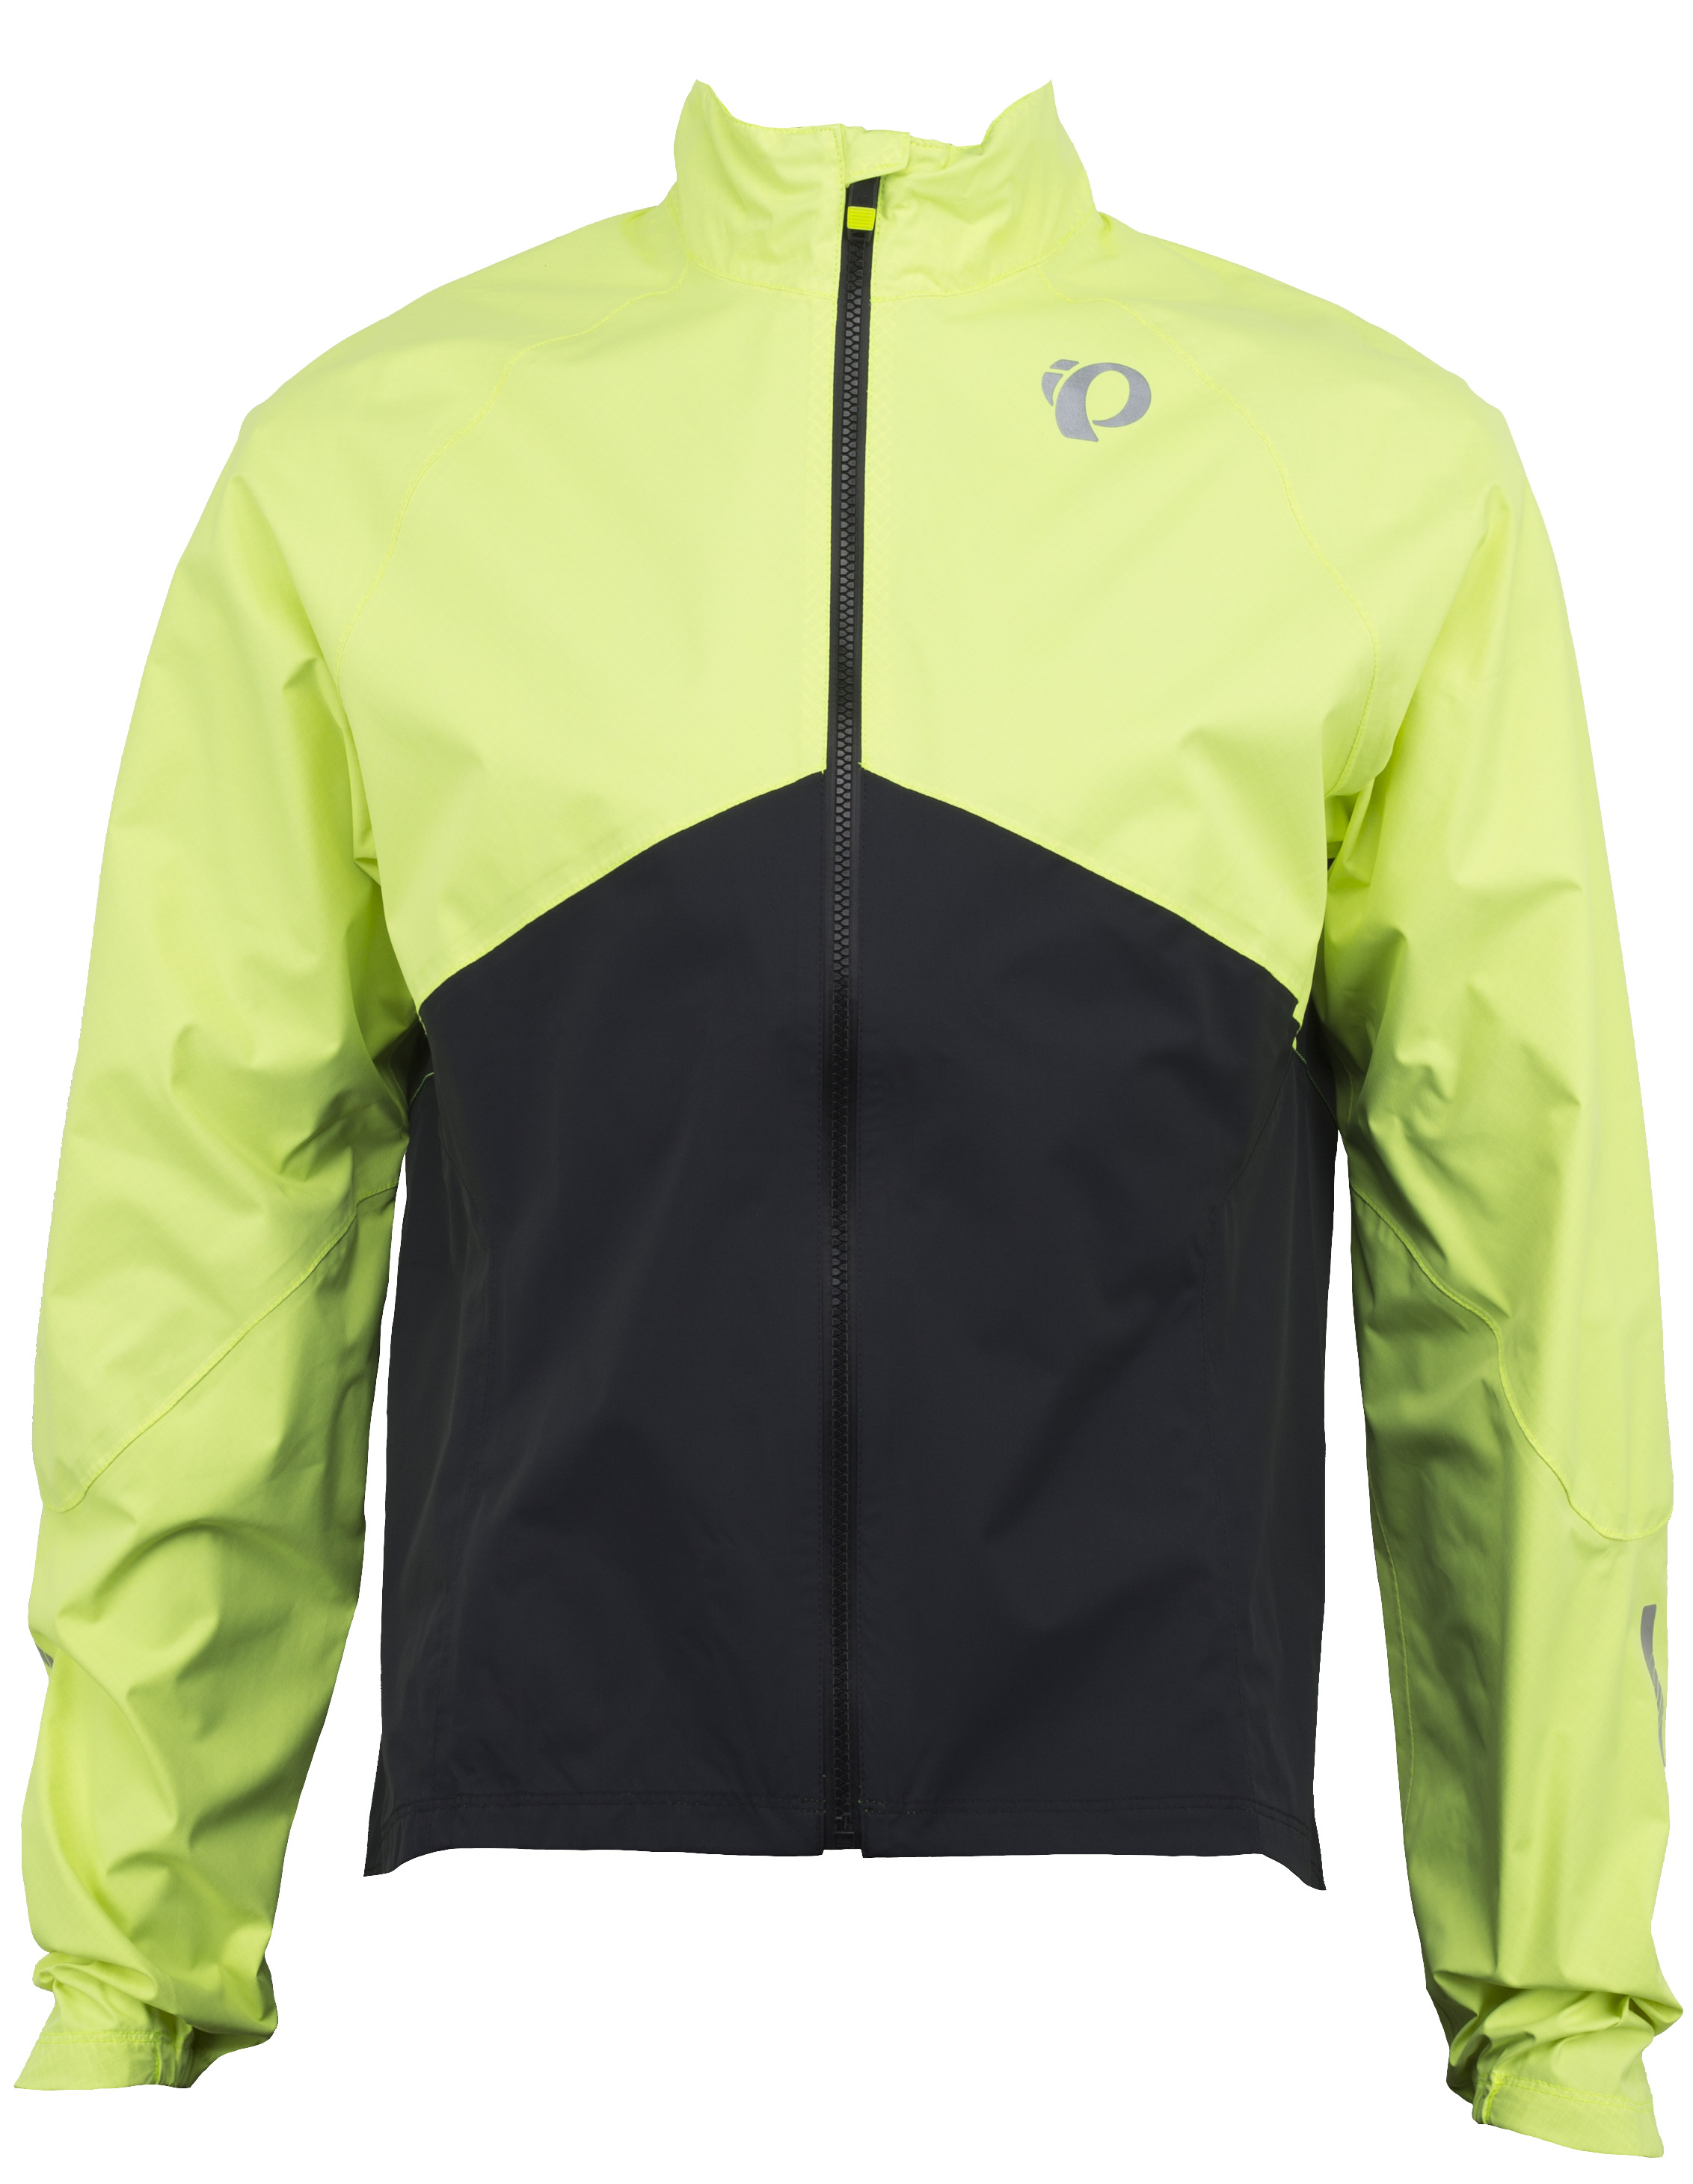 ZAPTEX Bike Underwear Shorts for Men Cycling Cloth Accessories